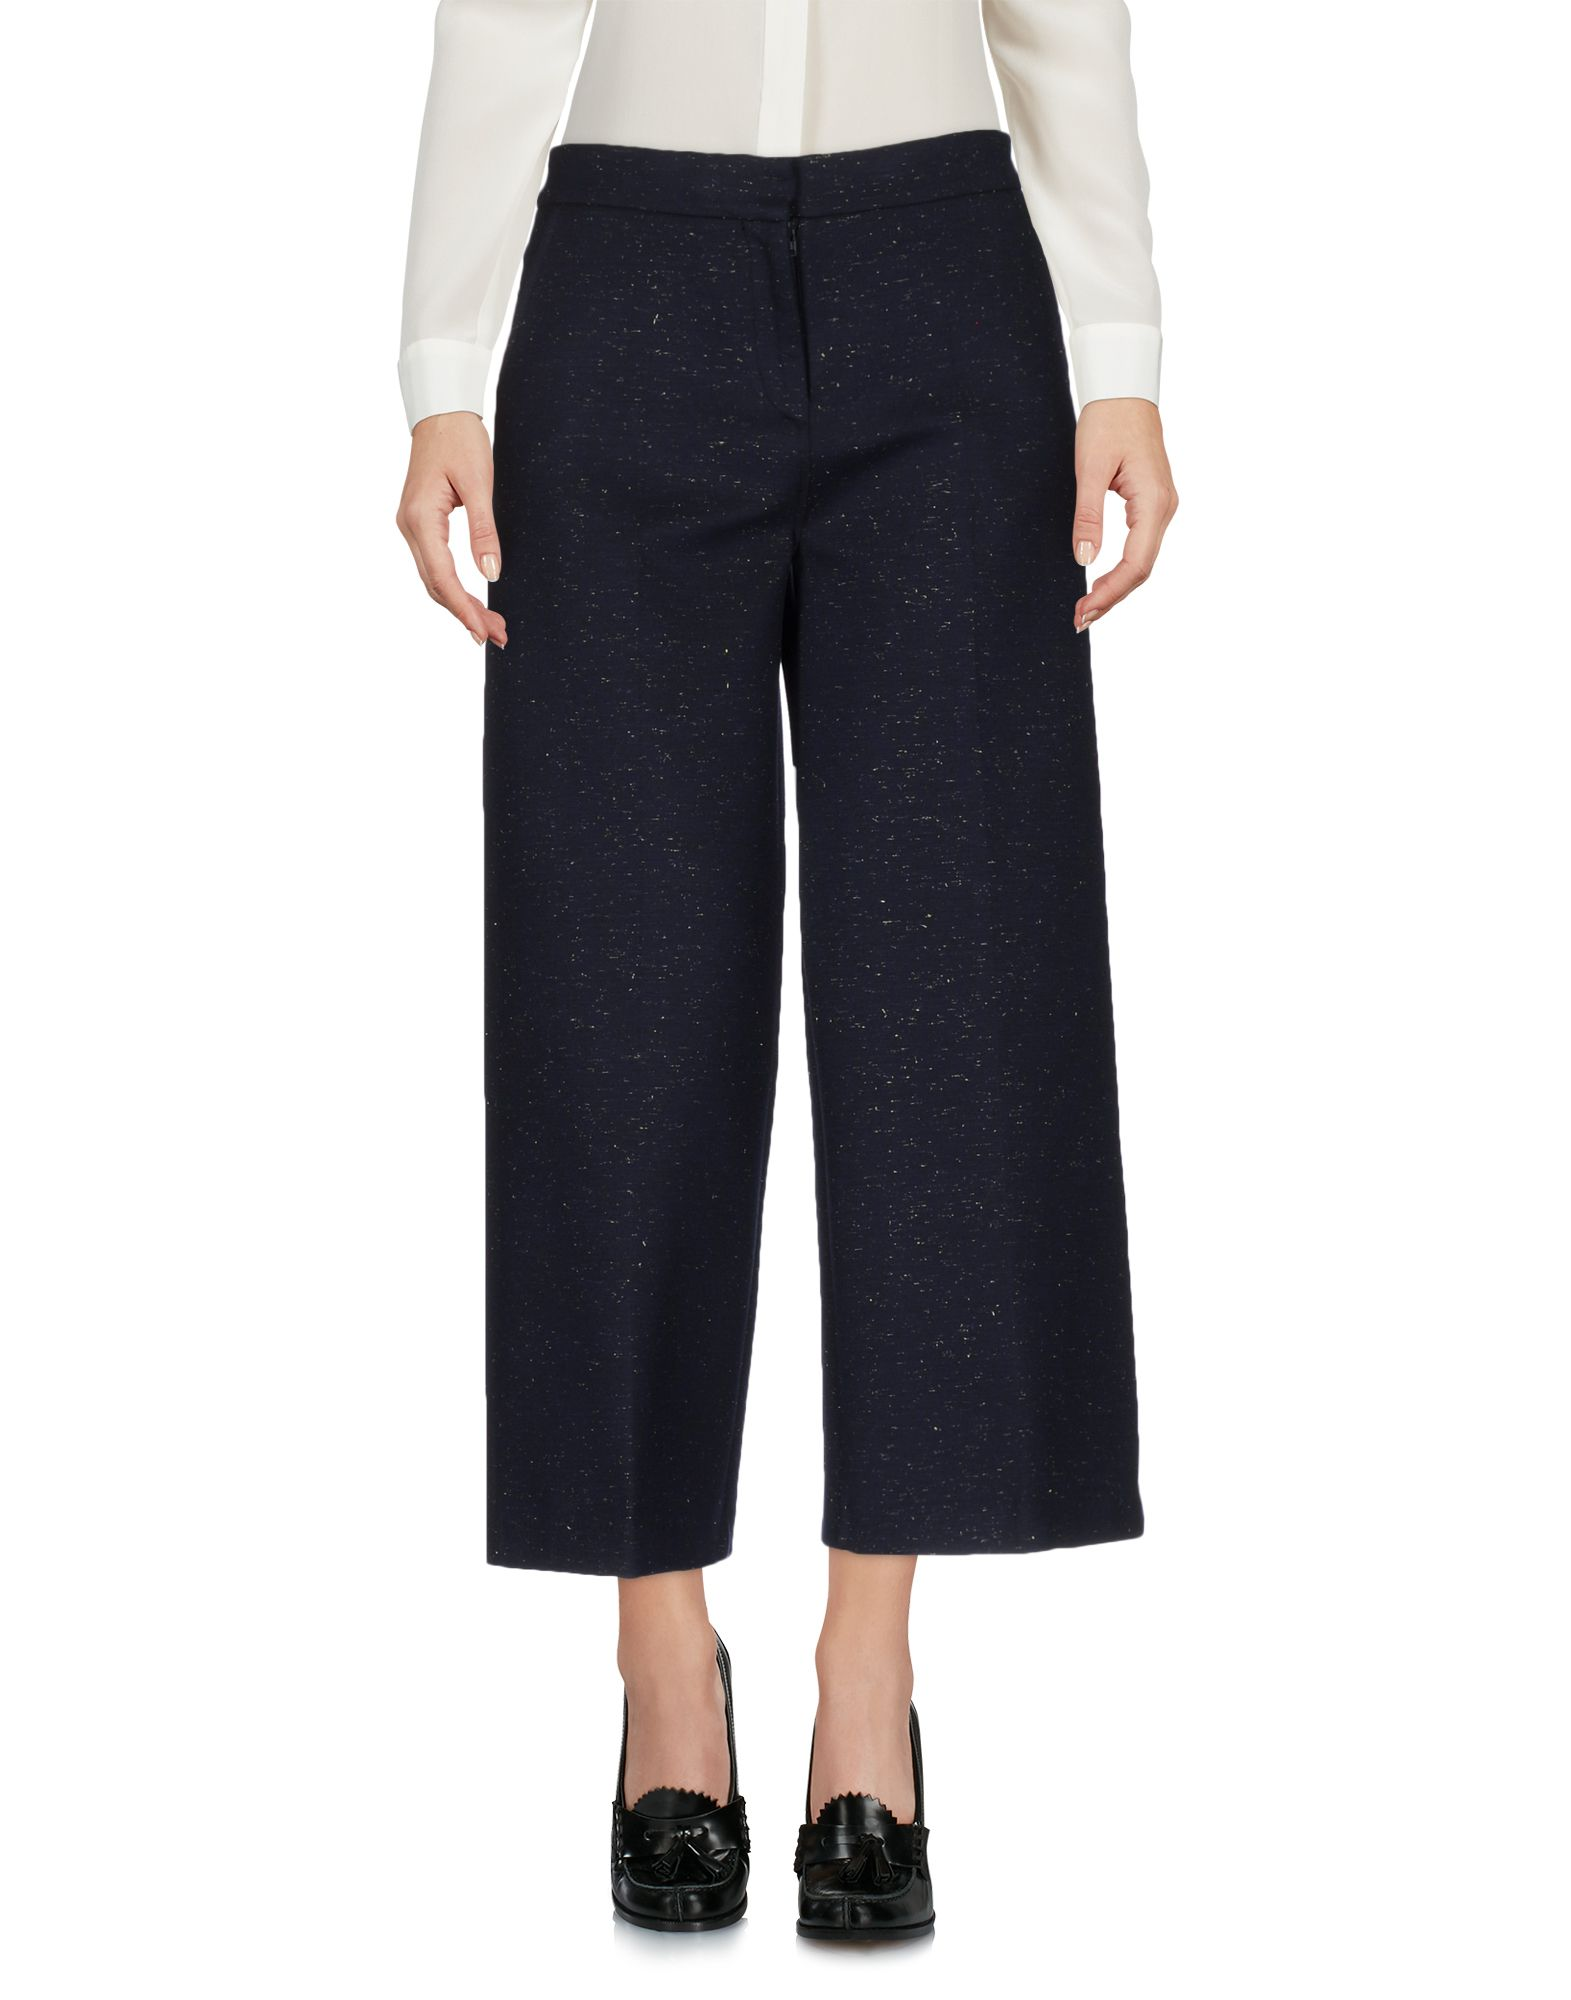 FemmesAcheter À Blumarine Pantalons En Classiques Ligne sQthrdxCB